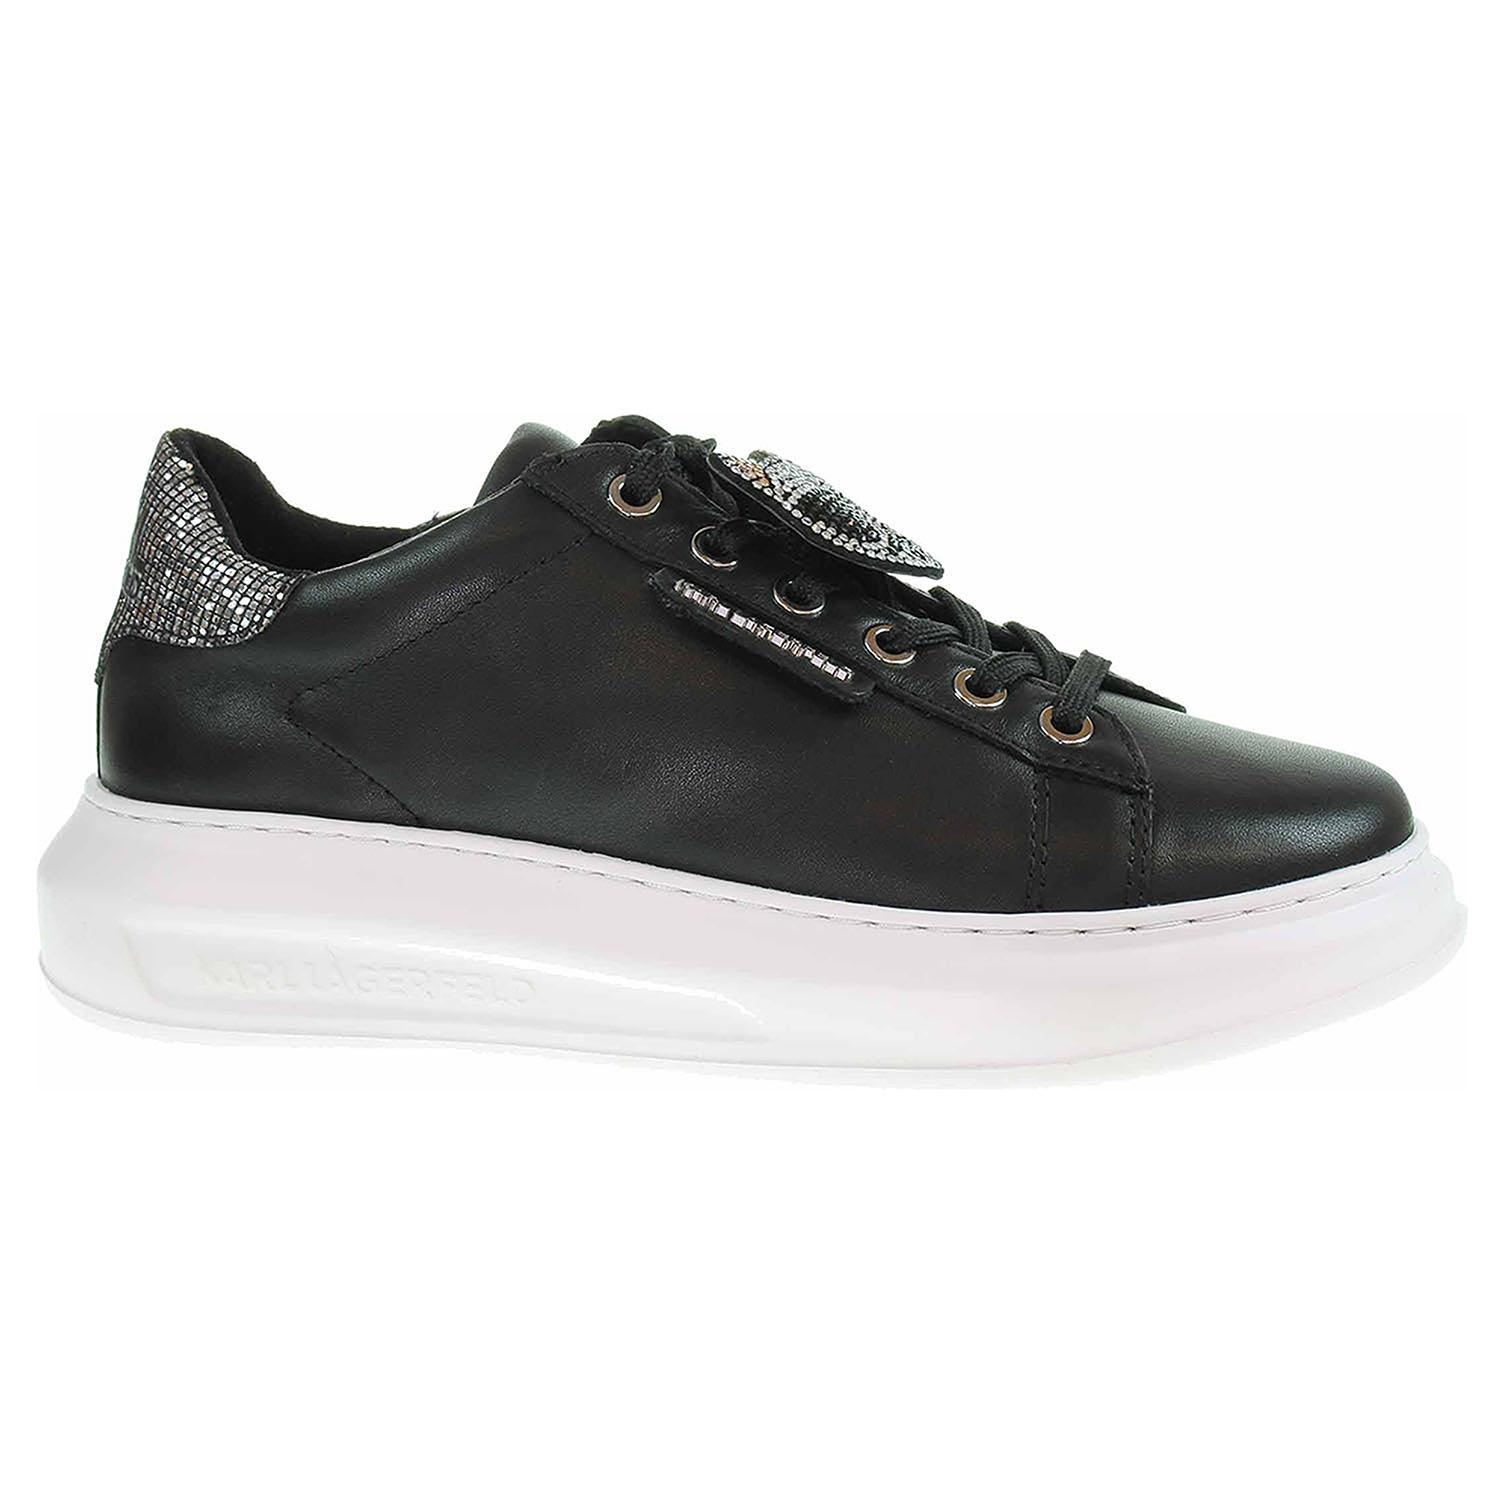 Dámská obuv Karl Lagerfeld KL62576 000 black lthr KL62576 000 39